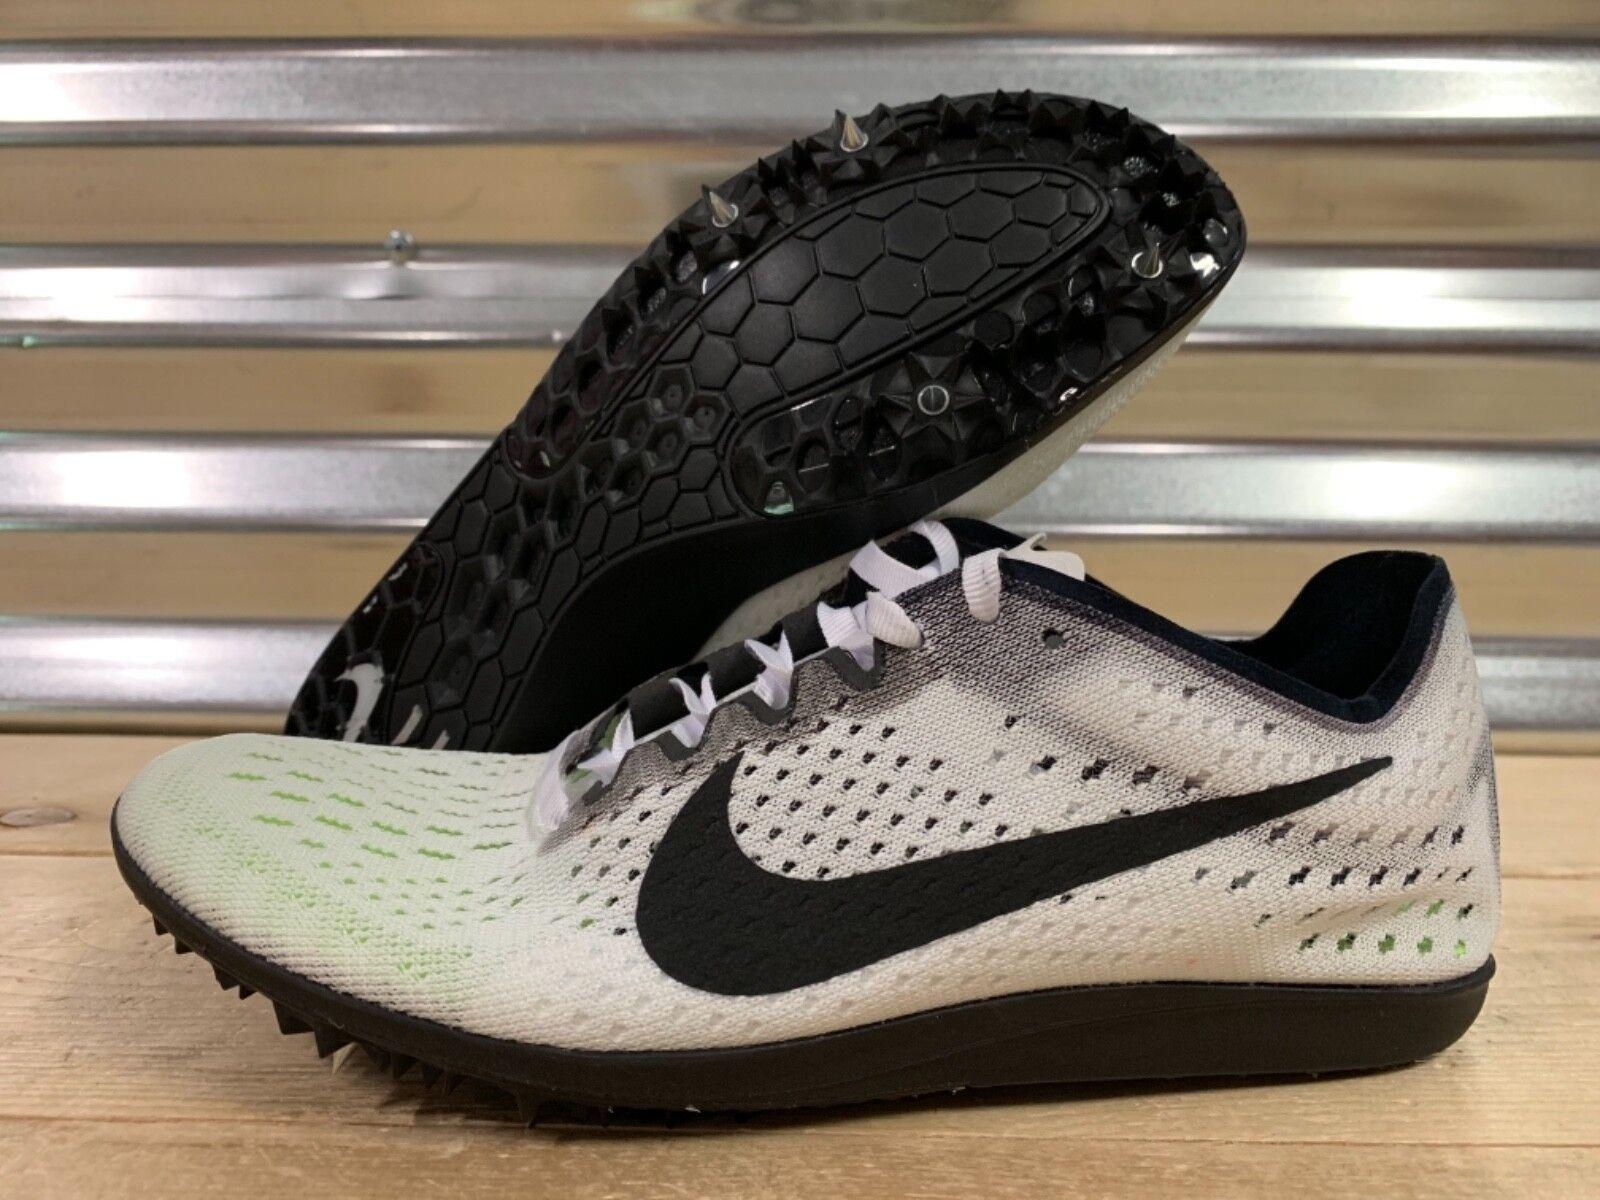 Nike Zoom Matumbo 3 Track Spikes White Black Oreo SZ SZ SZ ( 835995-107 ) b79734